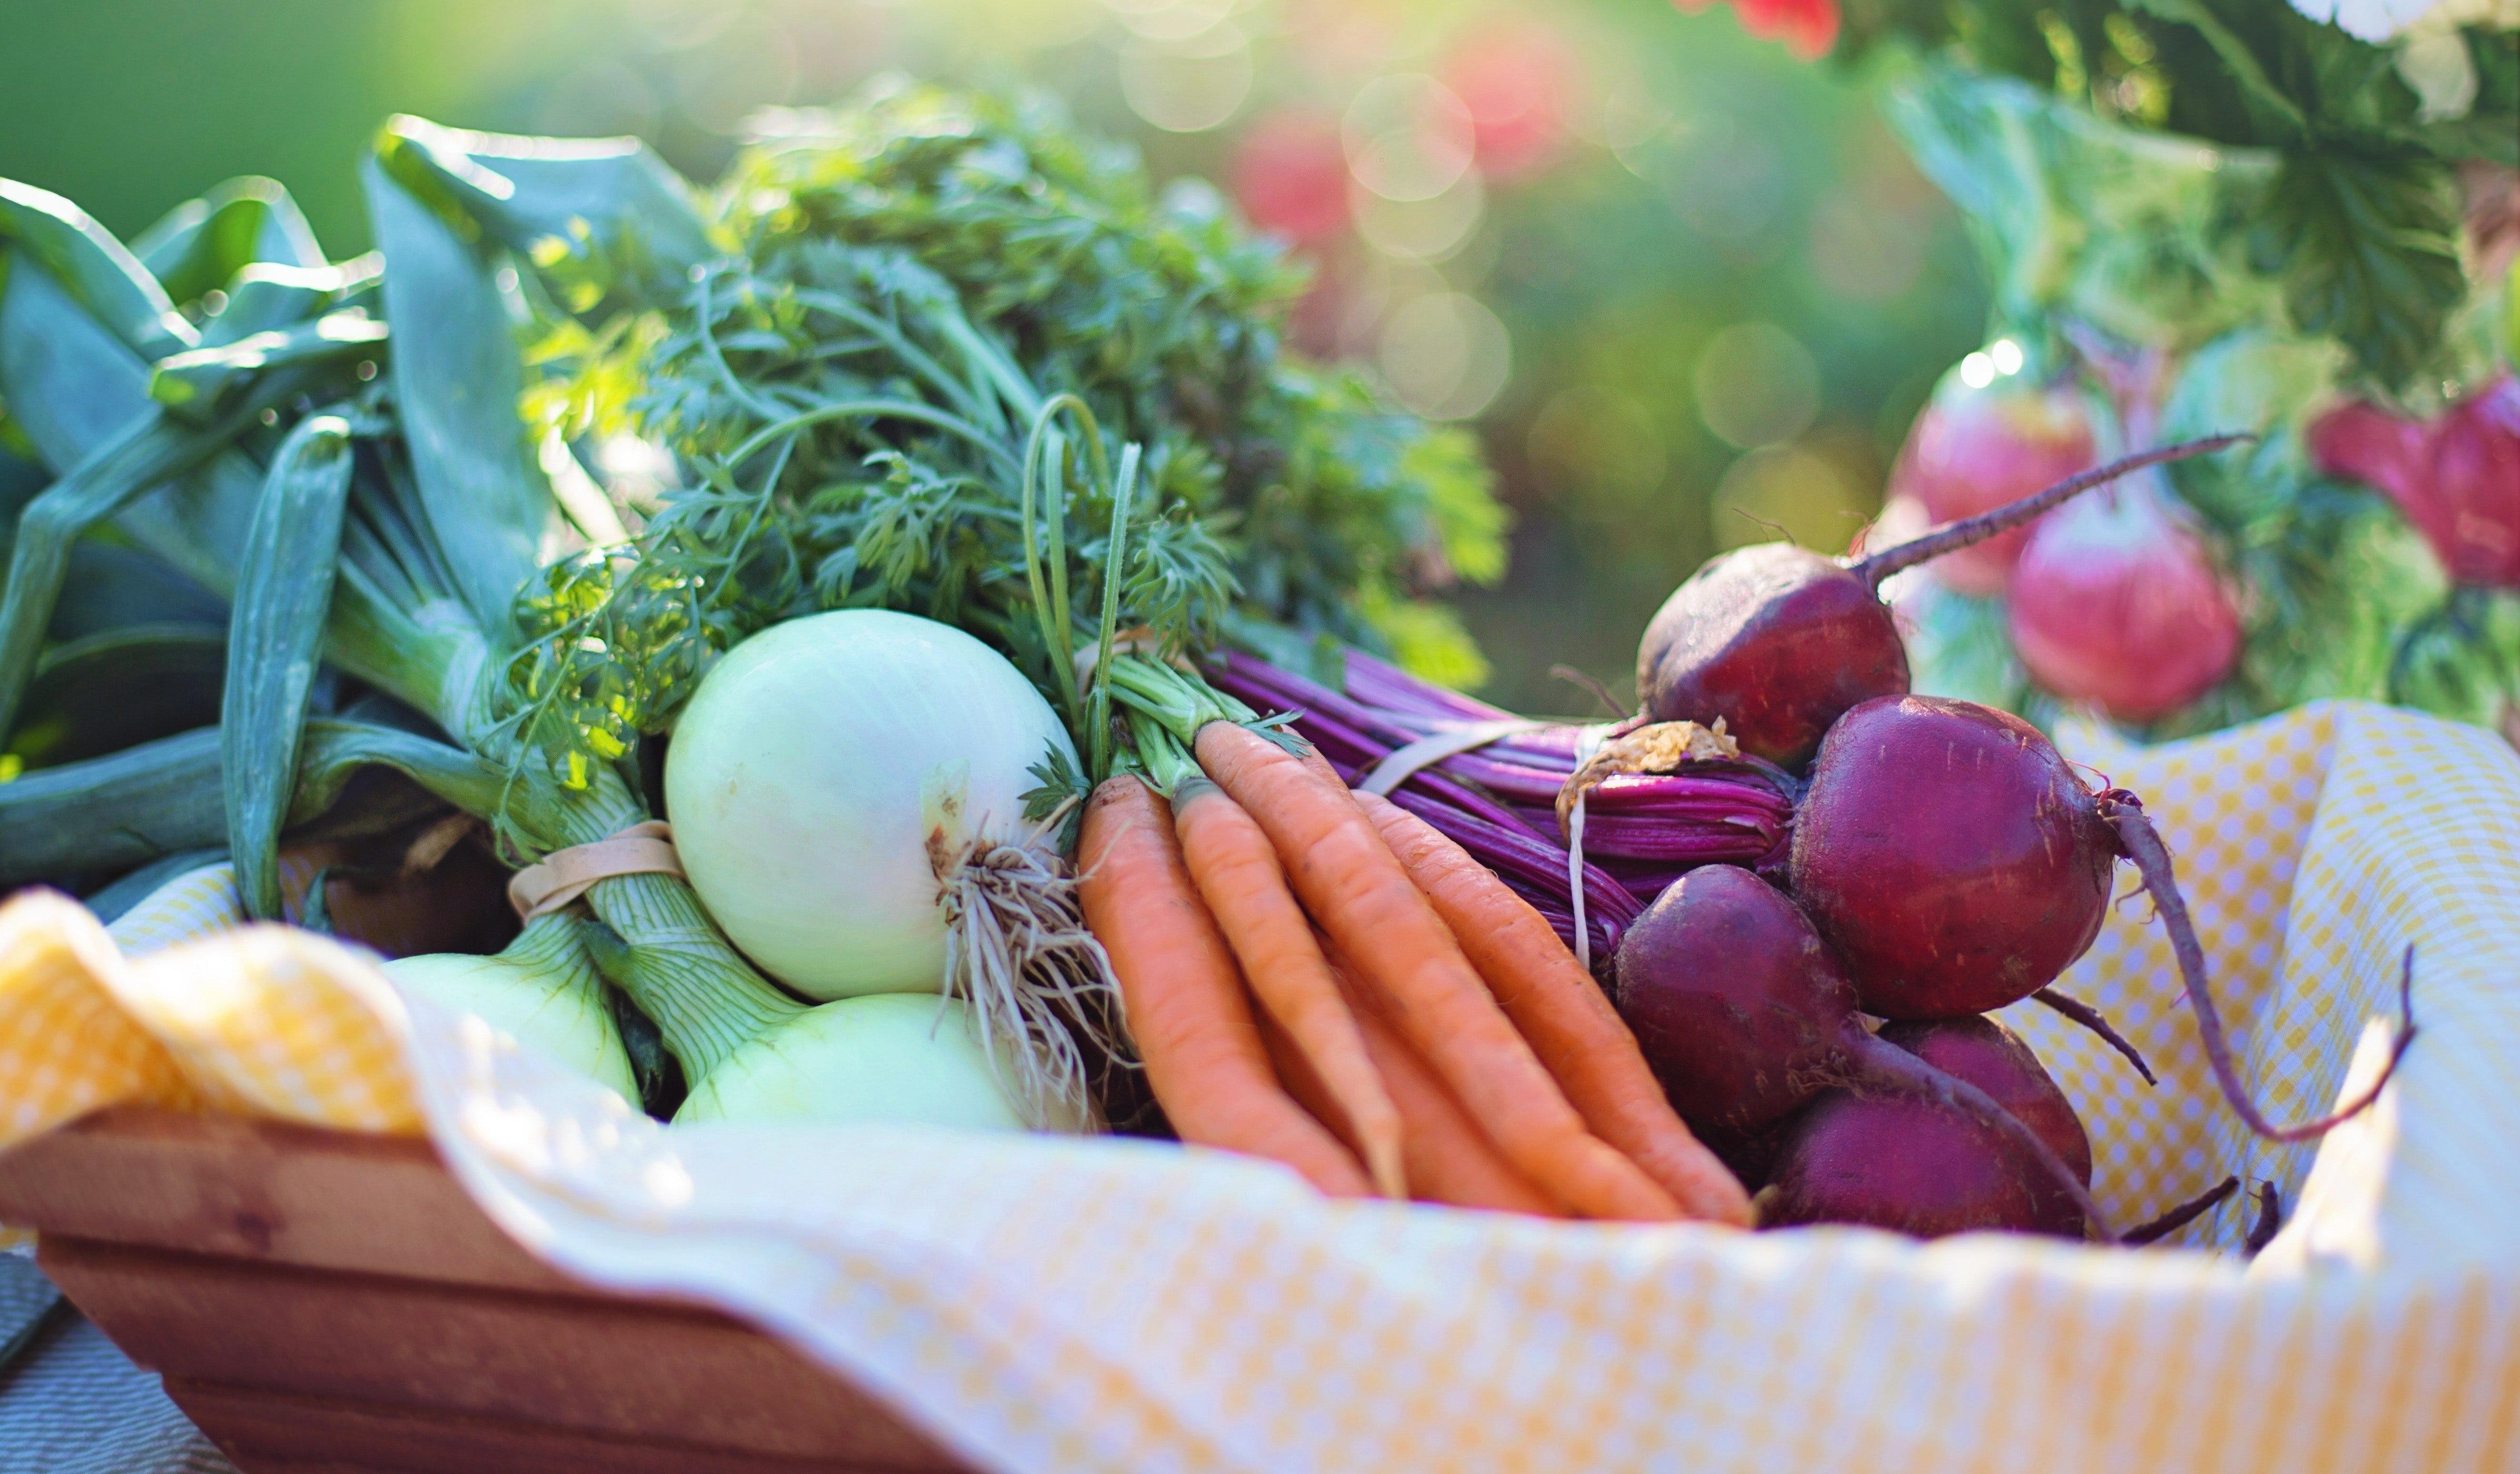 agriculture-basket-beets-533360-452295-edited